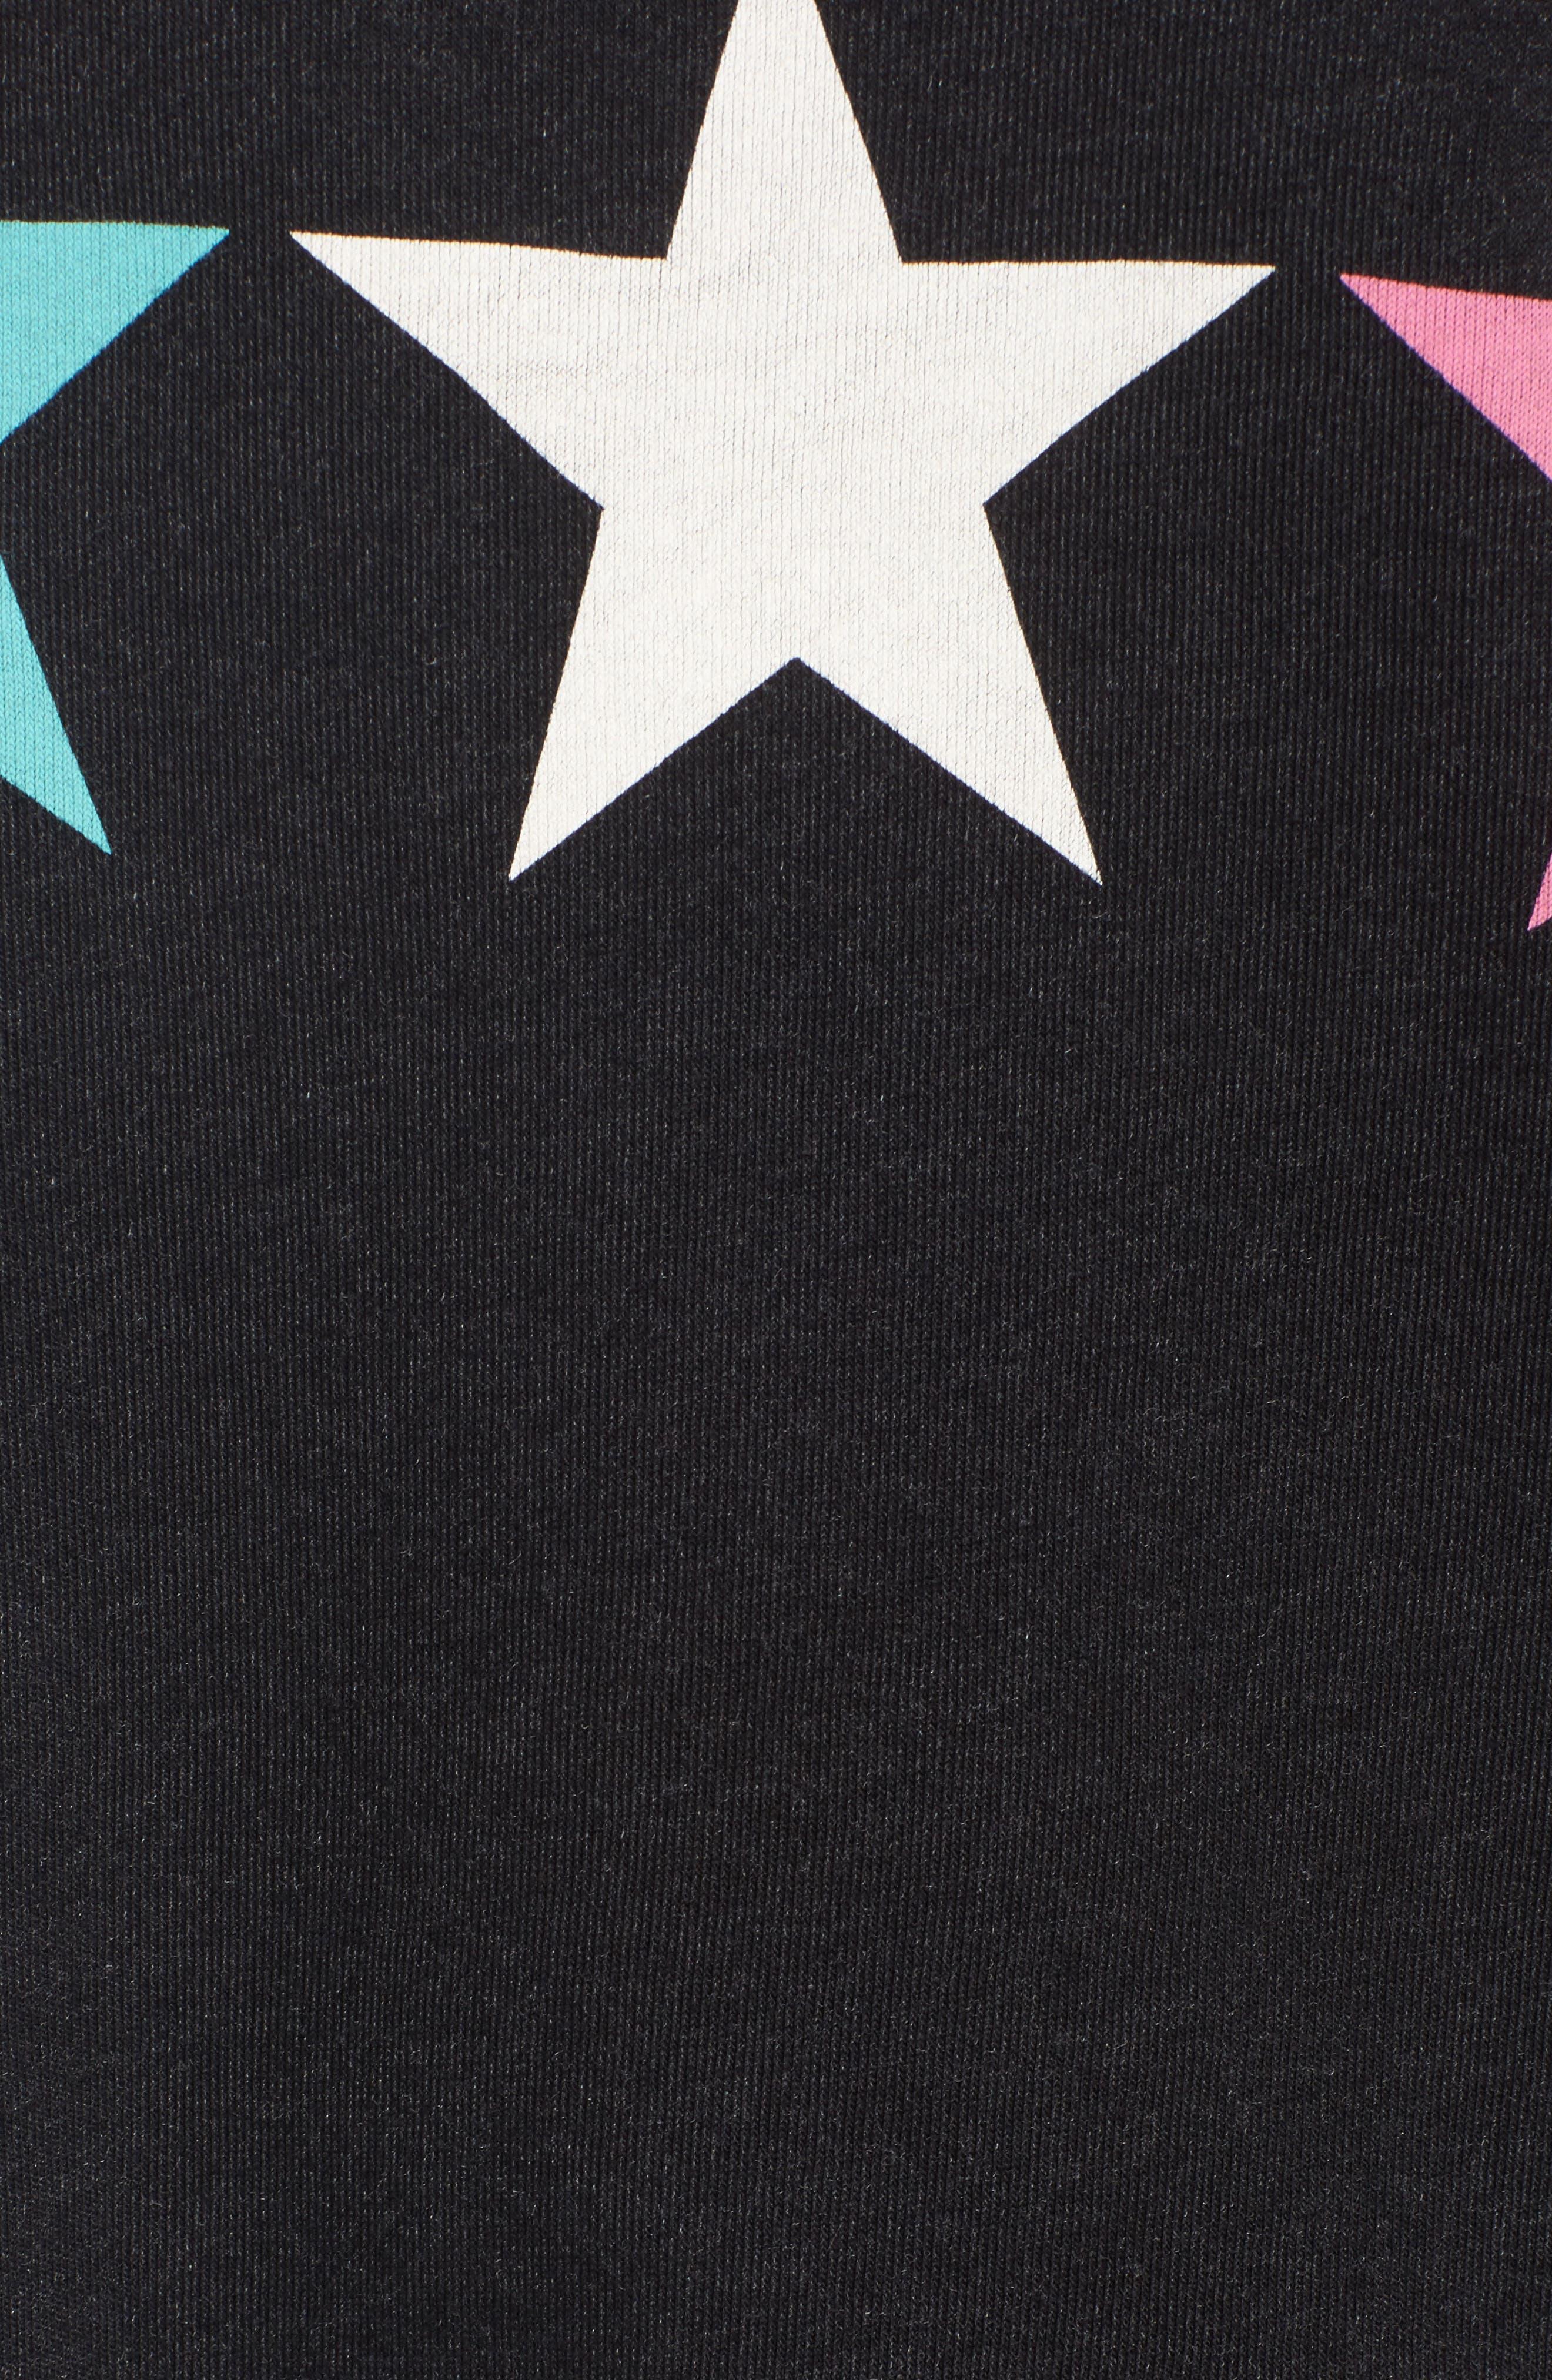 Arcade Stars Sommers Sweatshirt,                             Alternate thumbnail 6, color,                             Heathered Black